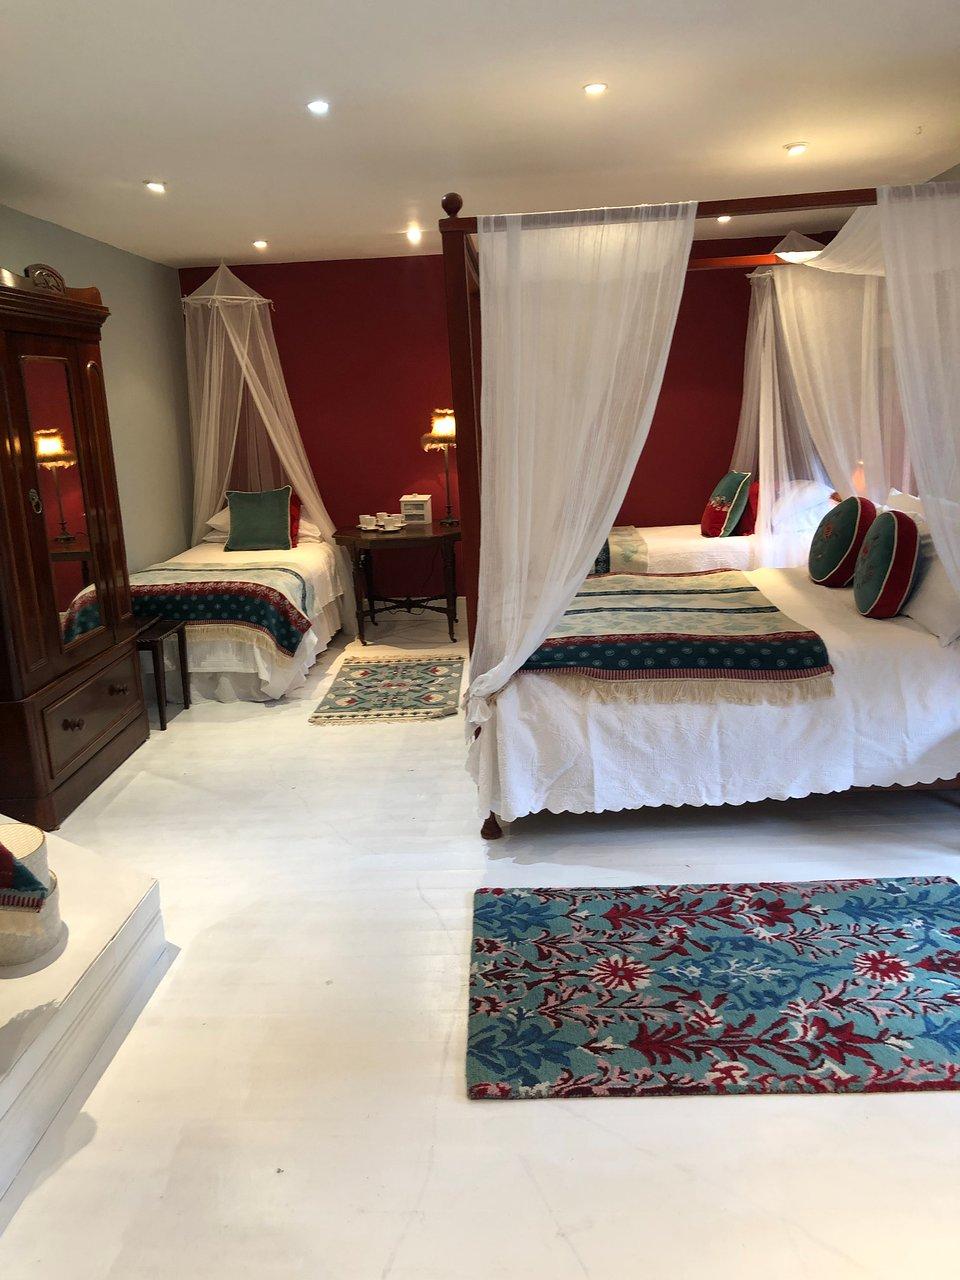 BARNABROW COUNTRY HOUSE - Prices & Villa - TripAdvisor